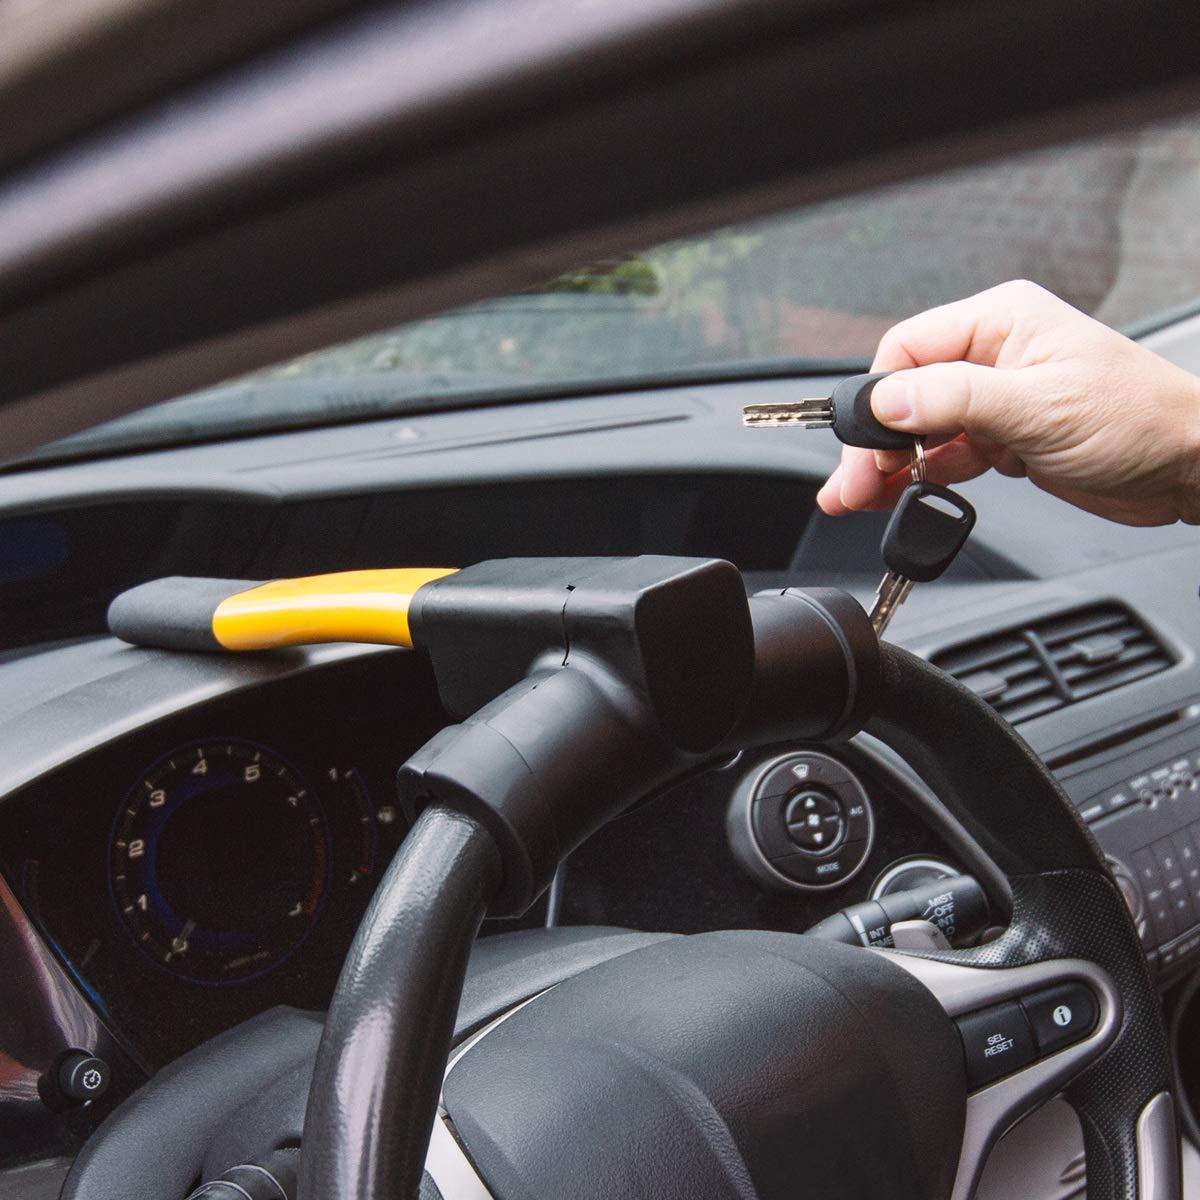 cerradura antirrobo para volante de coche Cepo para volante